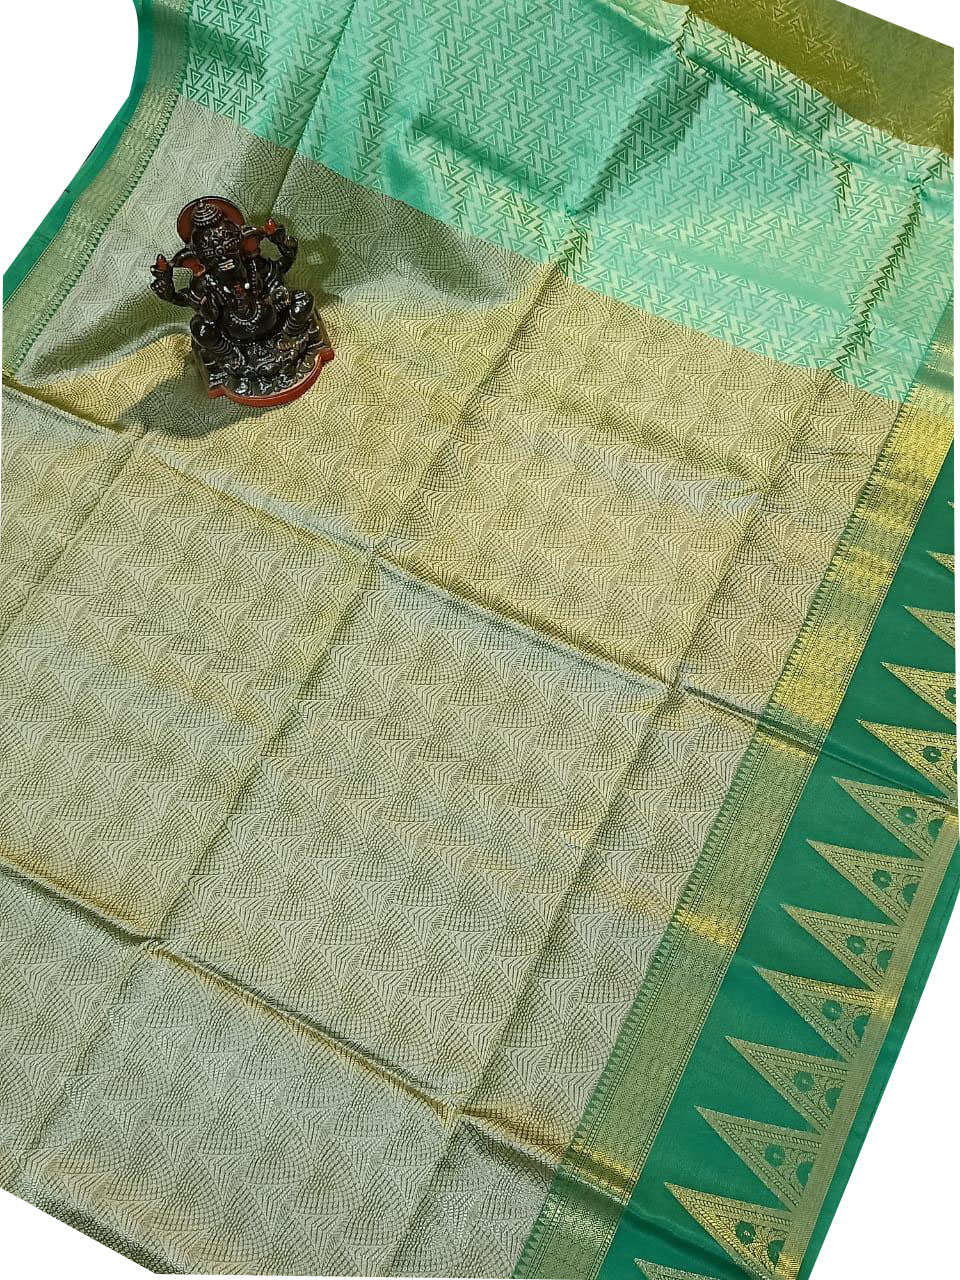 Green and Gray kora silk saree with kuppatam border